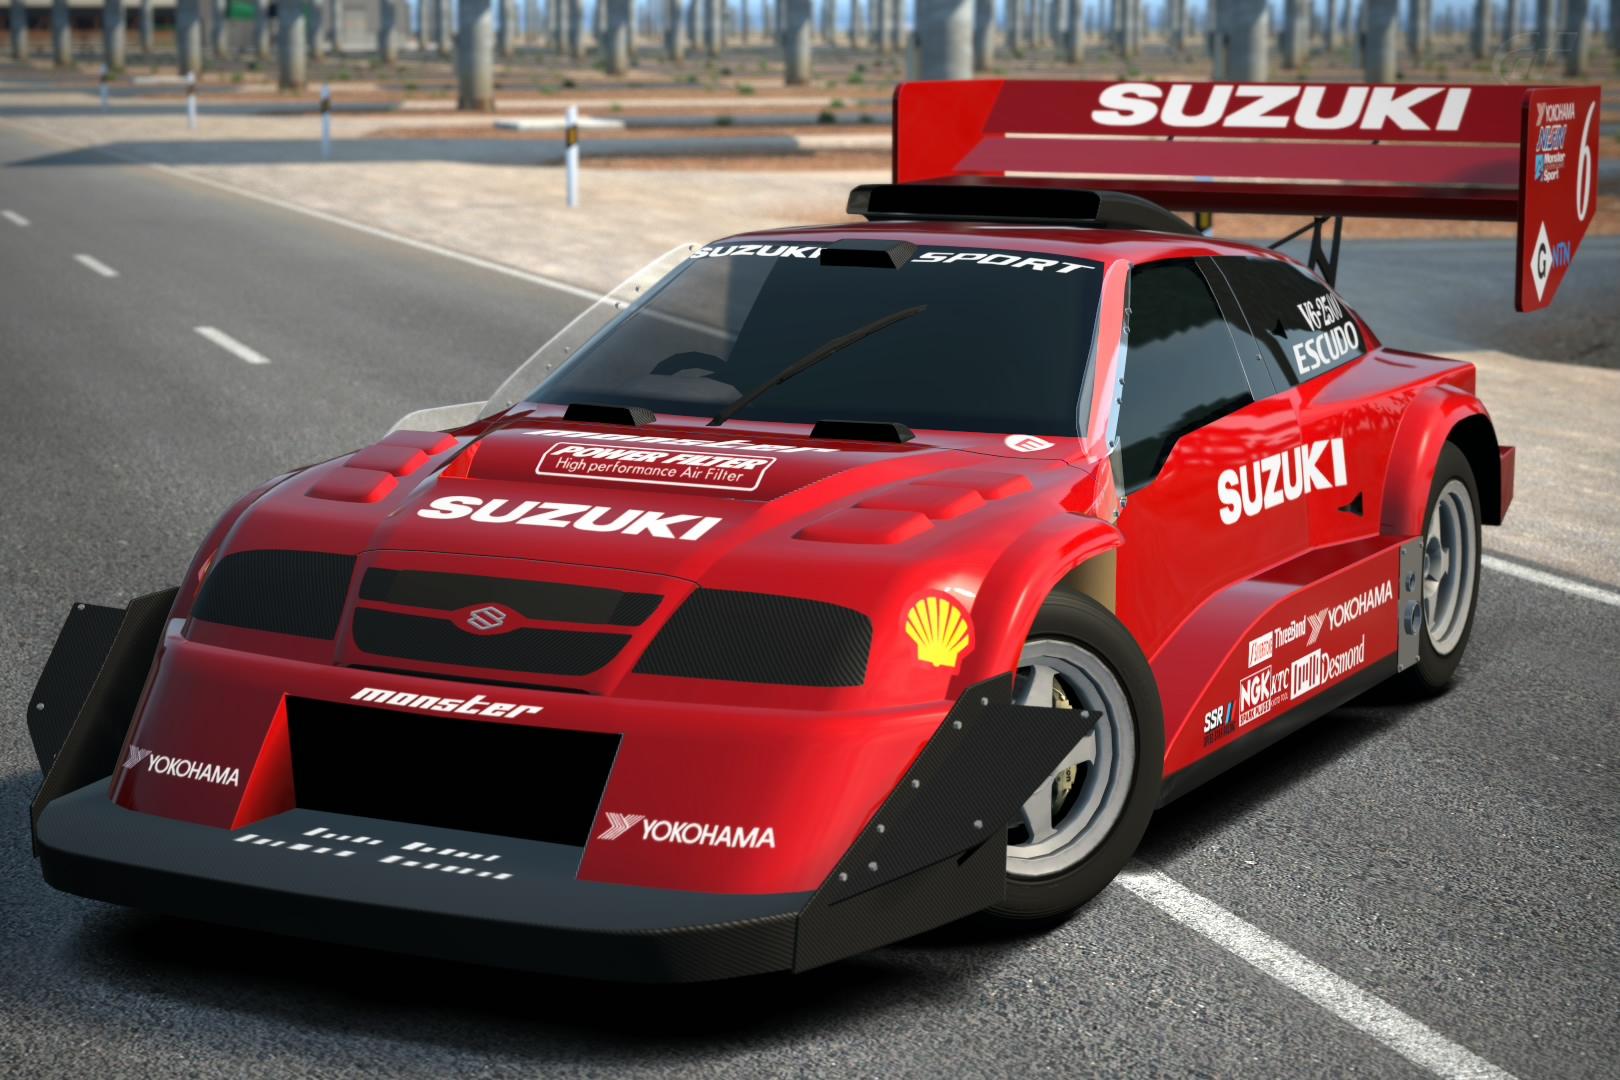 Turismo Car: Suzuki ESCUDO Dirt Trial Car '98